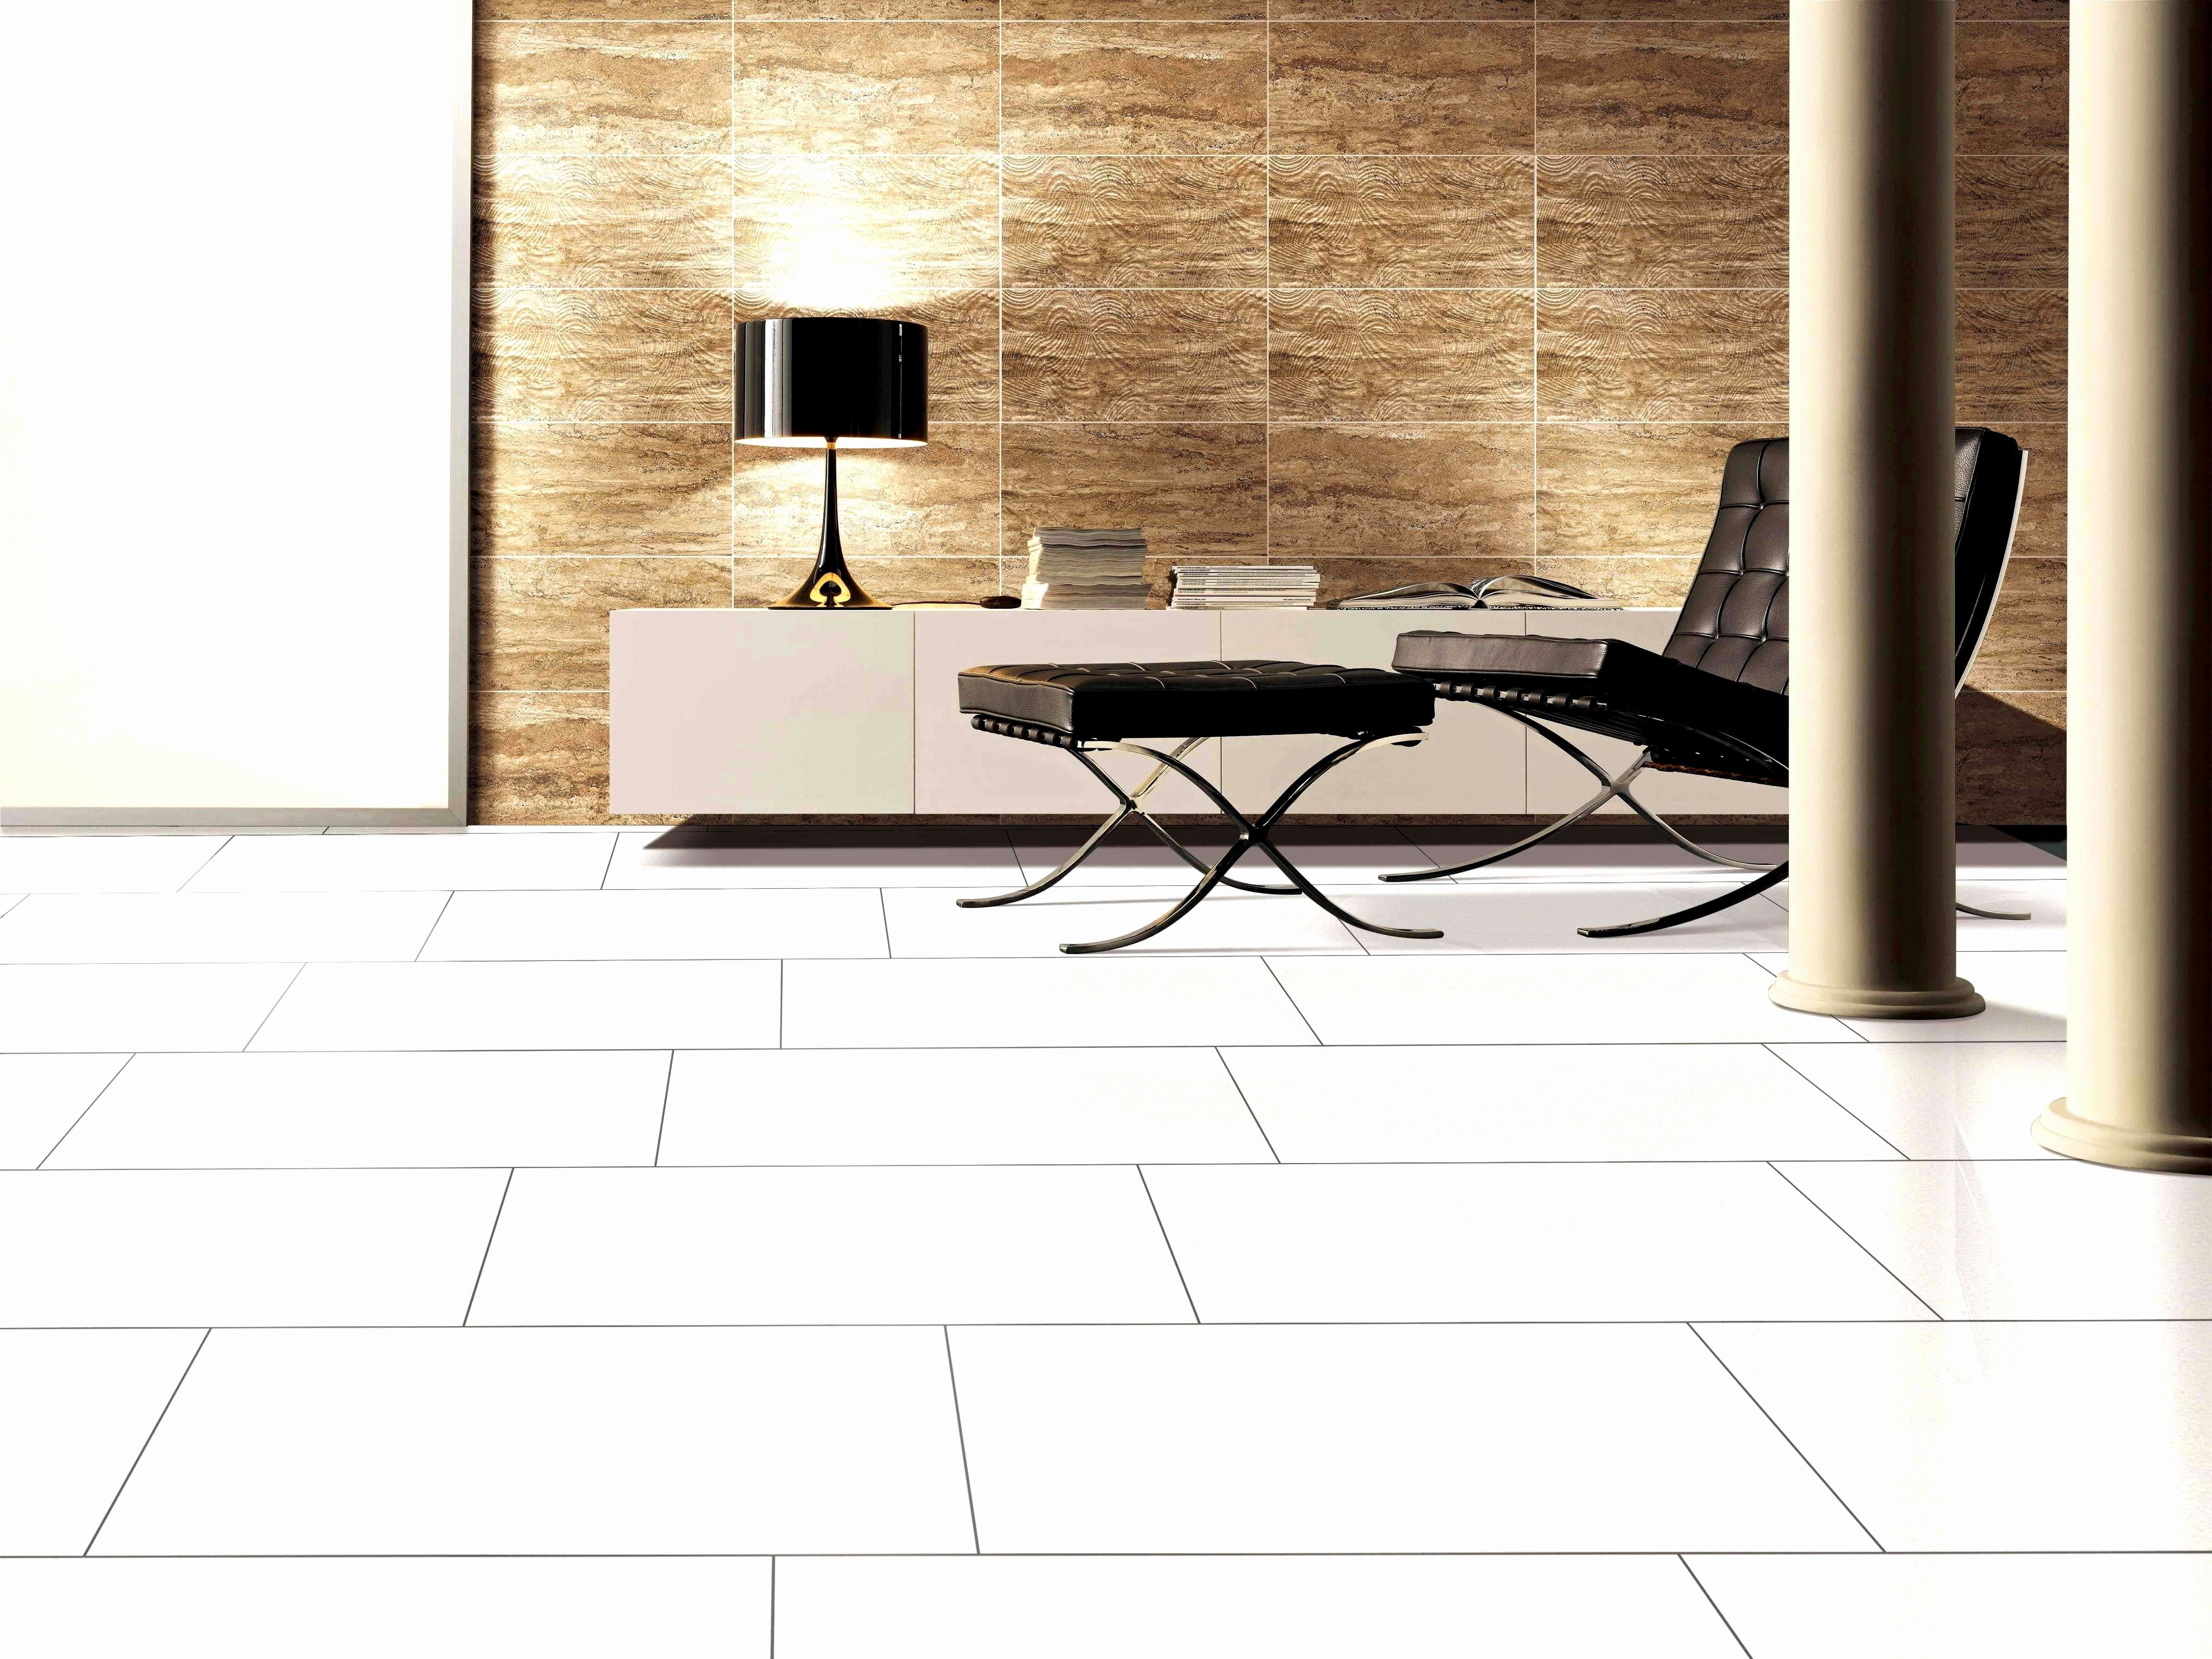 wholesale hardwood flooring of kitchen and bath tile luxury new tile floor mosaic bathroom 0d new pertaining to kitchen and bath tile luxury new tile floor mosaic bathroom 0d new